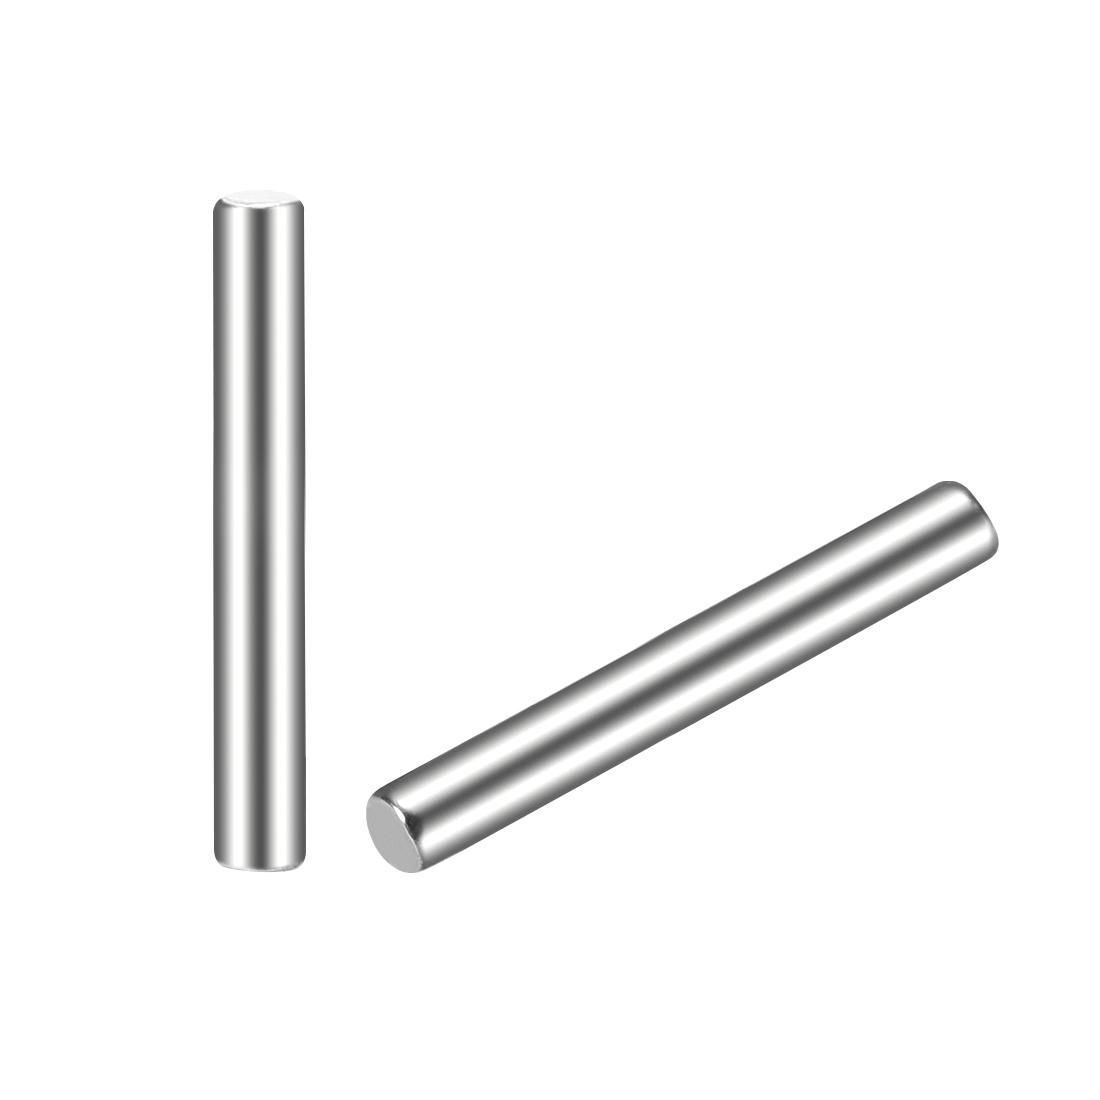 15Pcs 2mm x 16mm Dowel Pin 304 Stainless Steel Shelf Support Pin Fasten